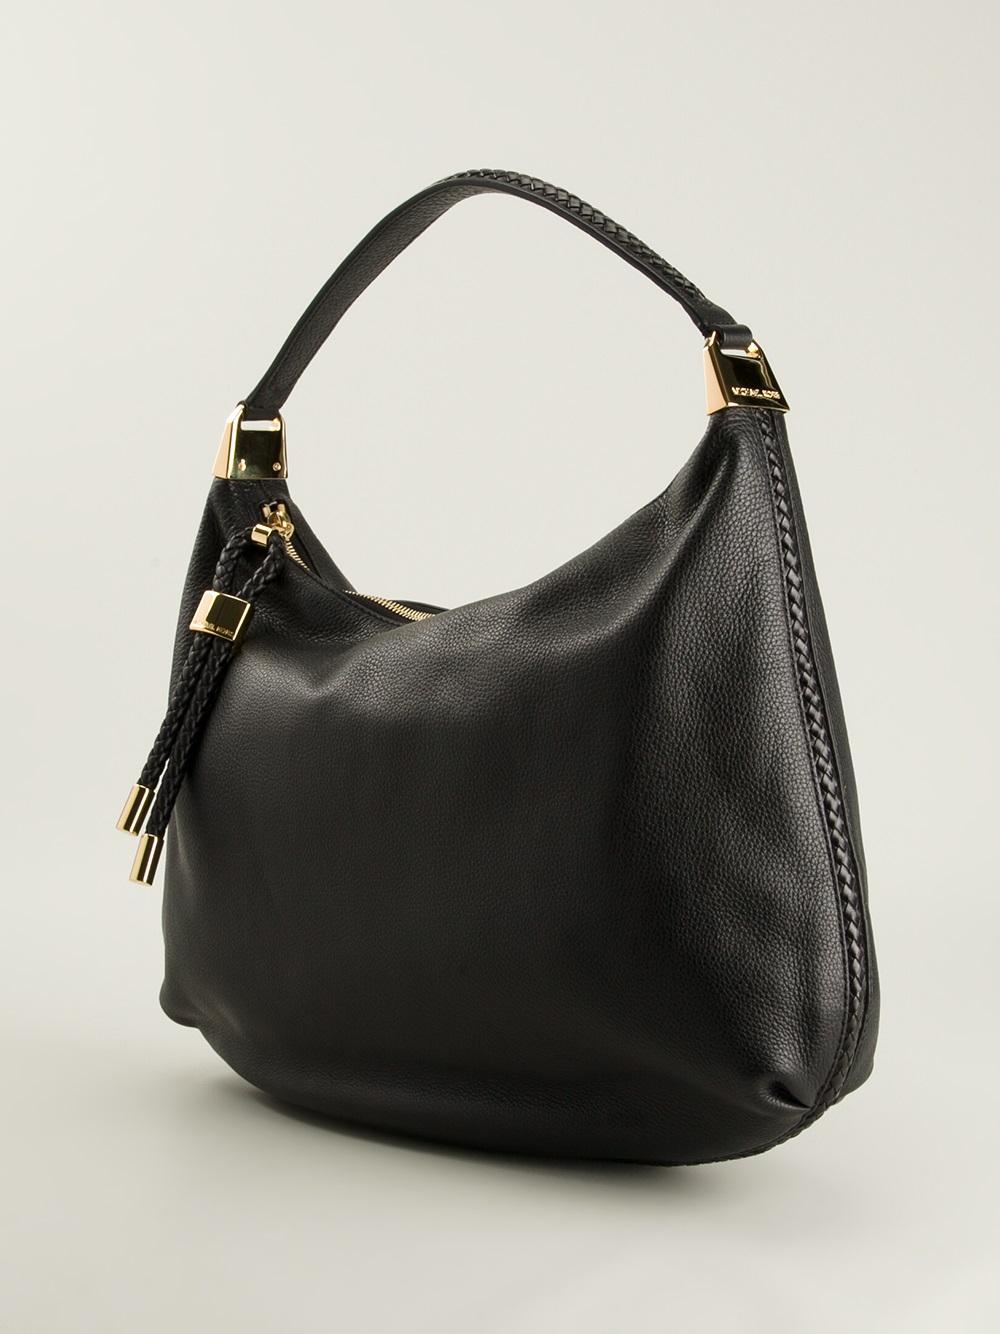 73319cbf64a8 ... low price michael kors skorpios hobo shoulder bag in black lyst b37c7  254be